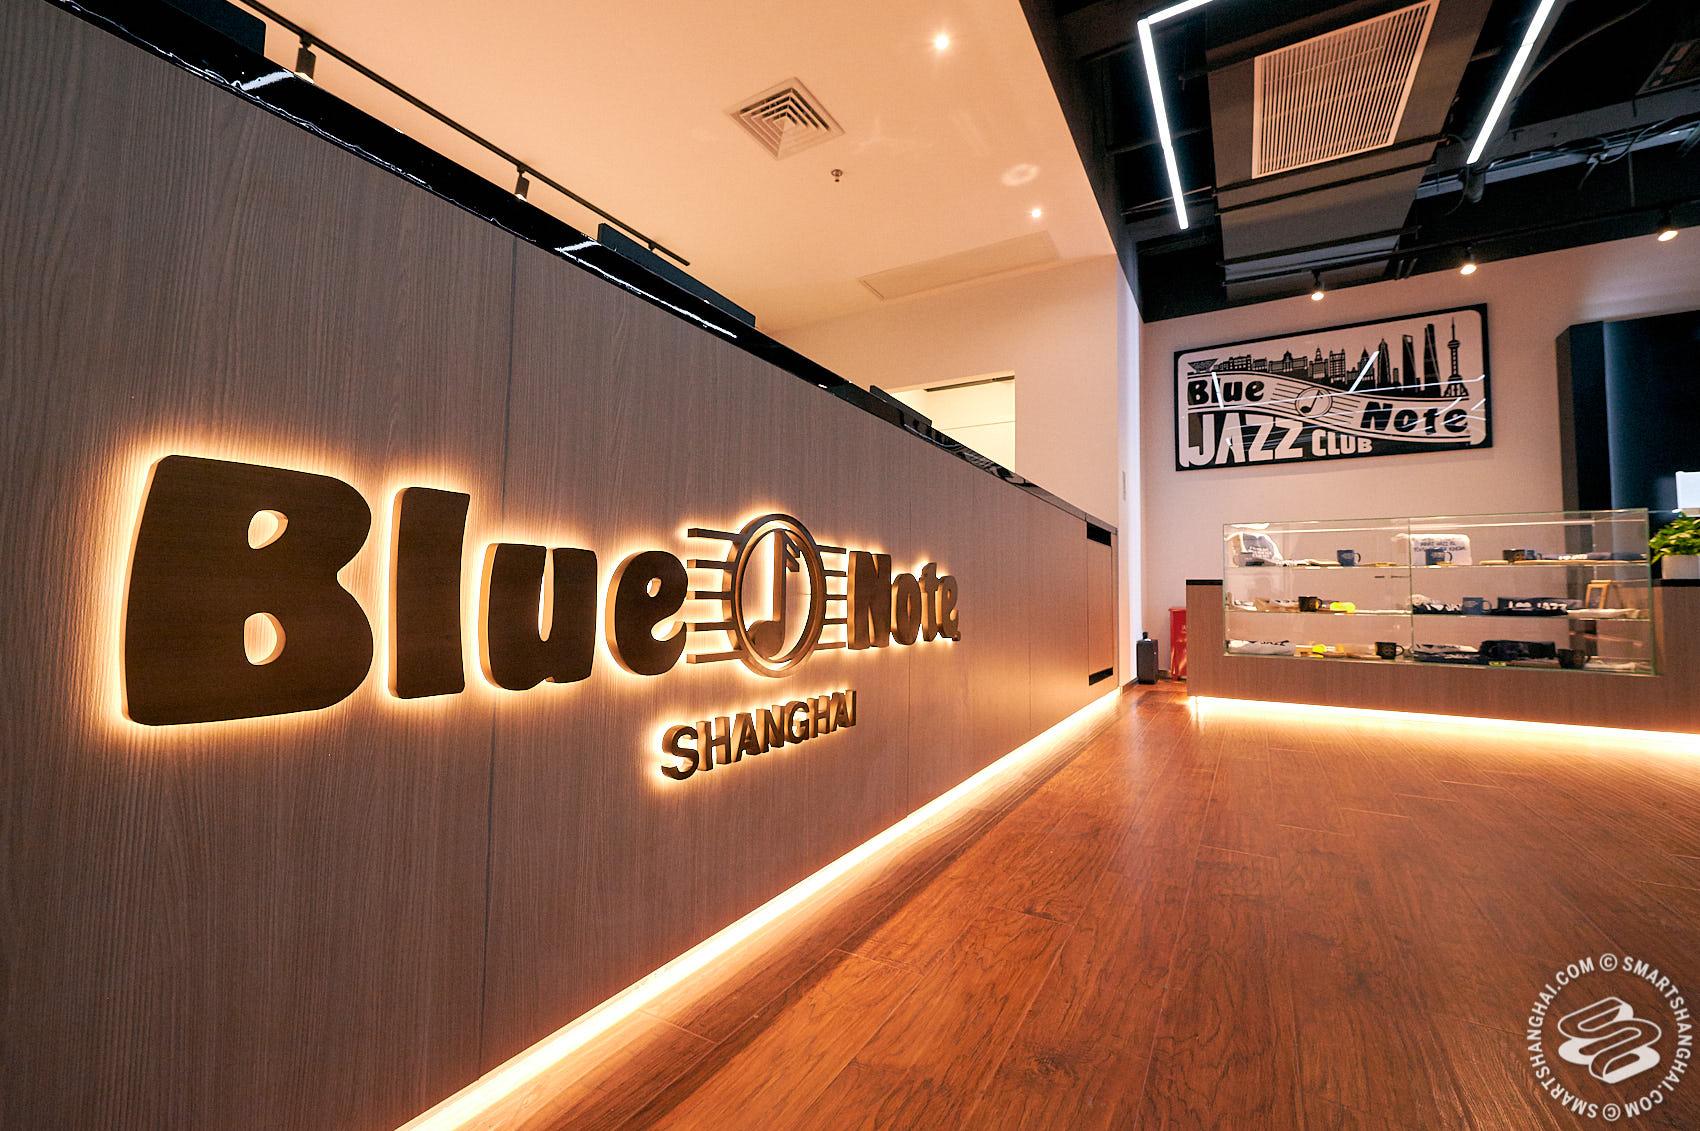 Blue Note Jazz Club Shanghai